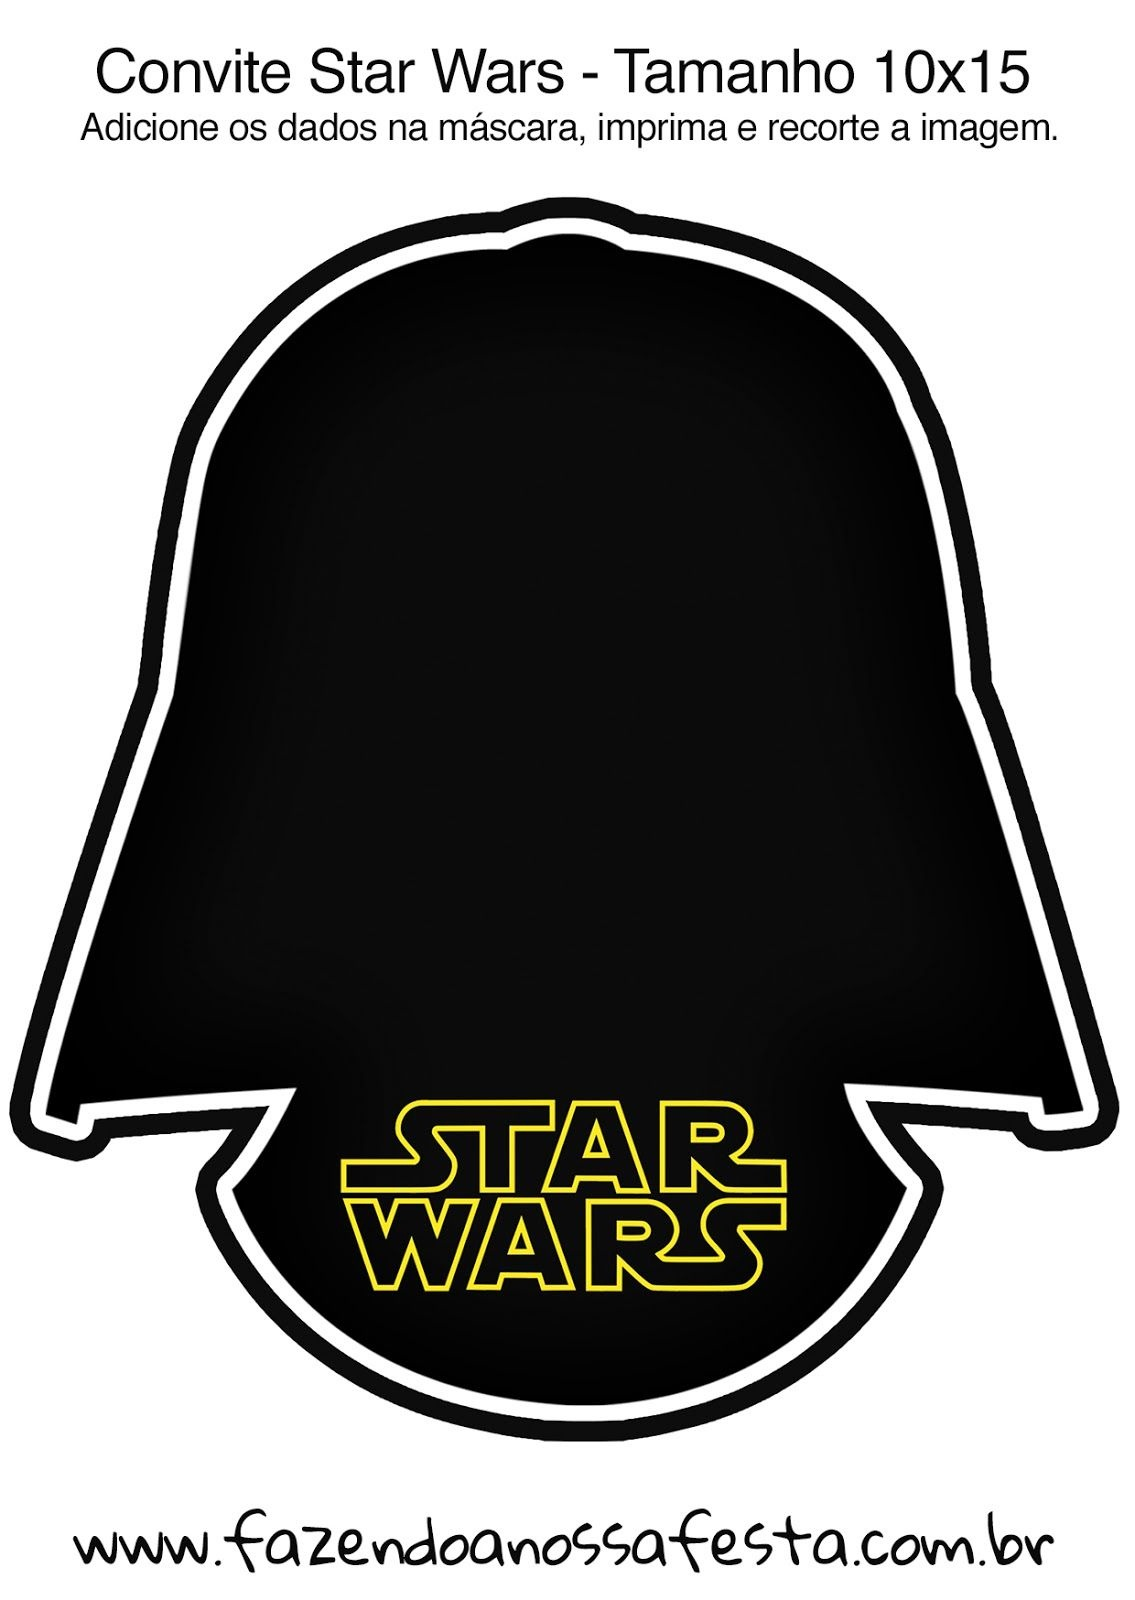 Star Wars: Free Printable Invitations. | Star Wars Party | Star Wars - Star Wars Invitations Free Printable